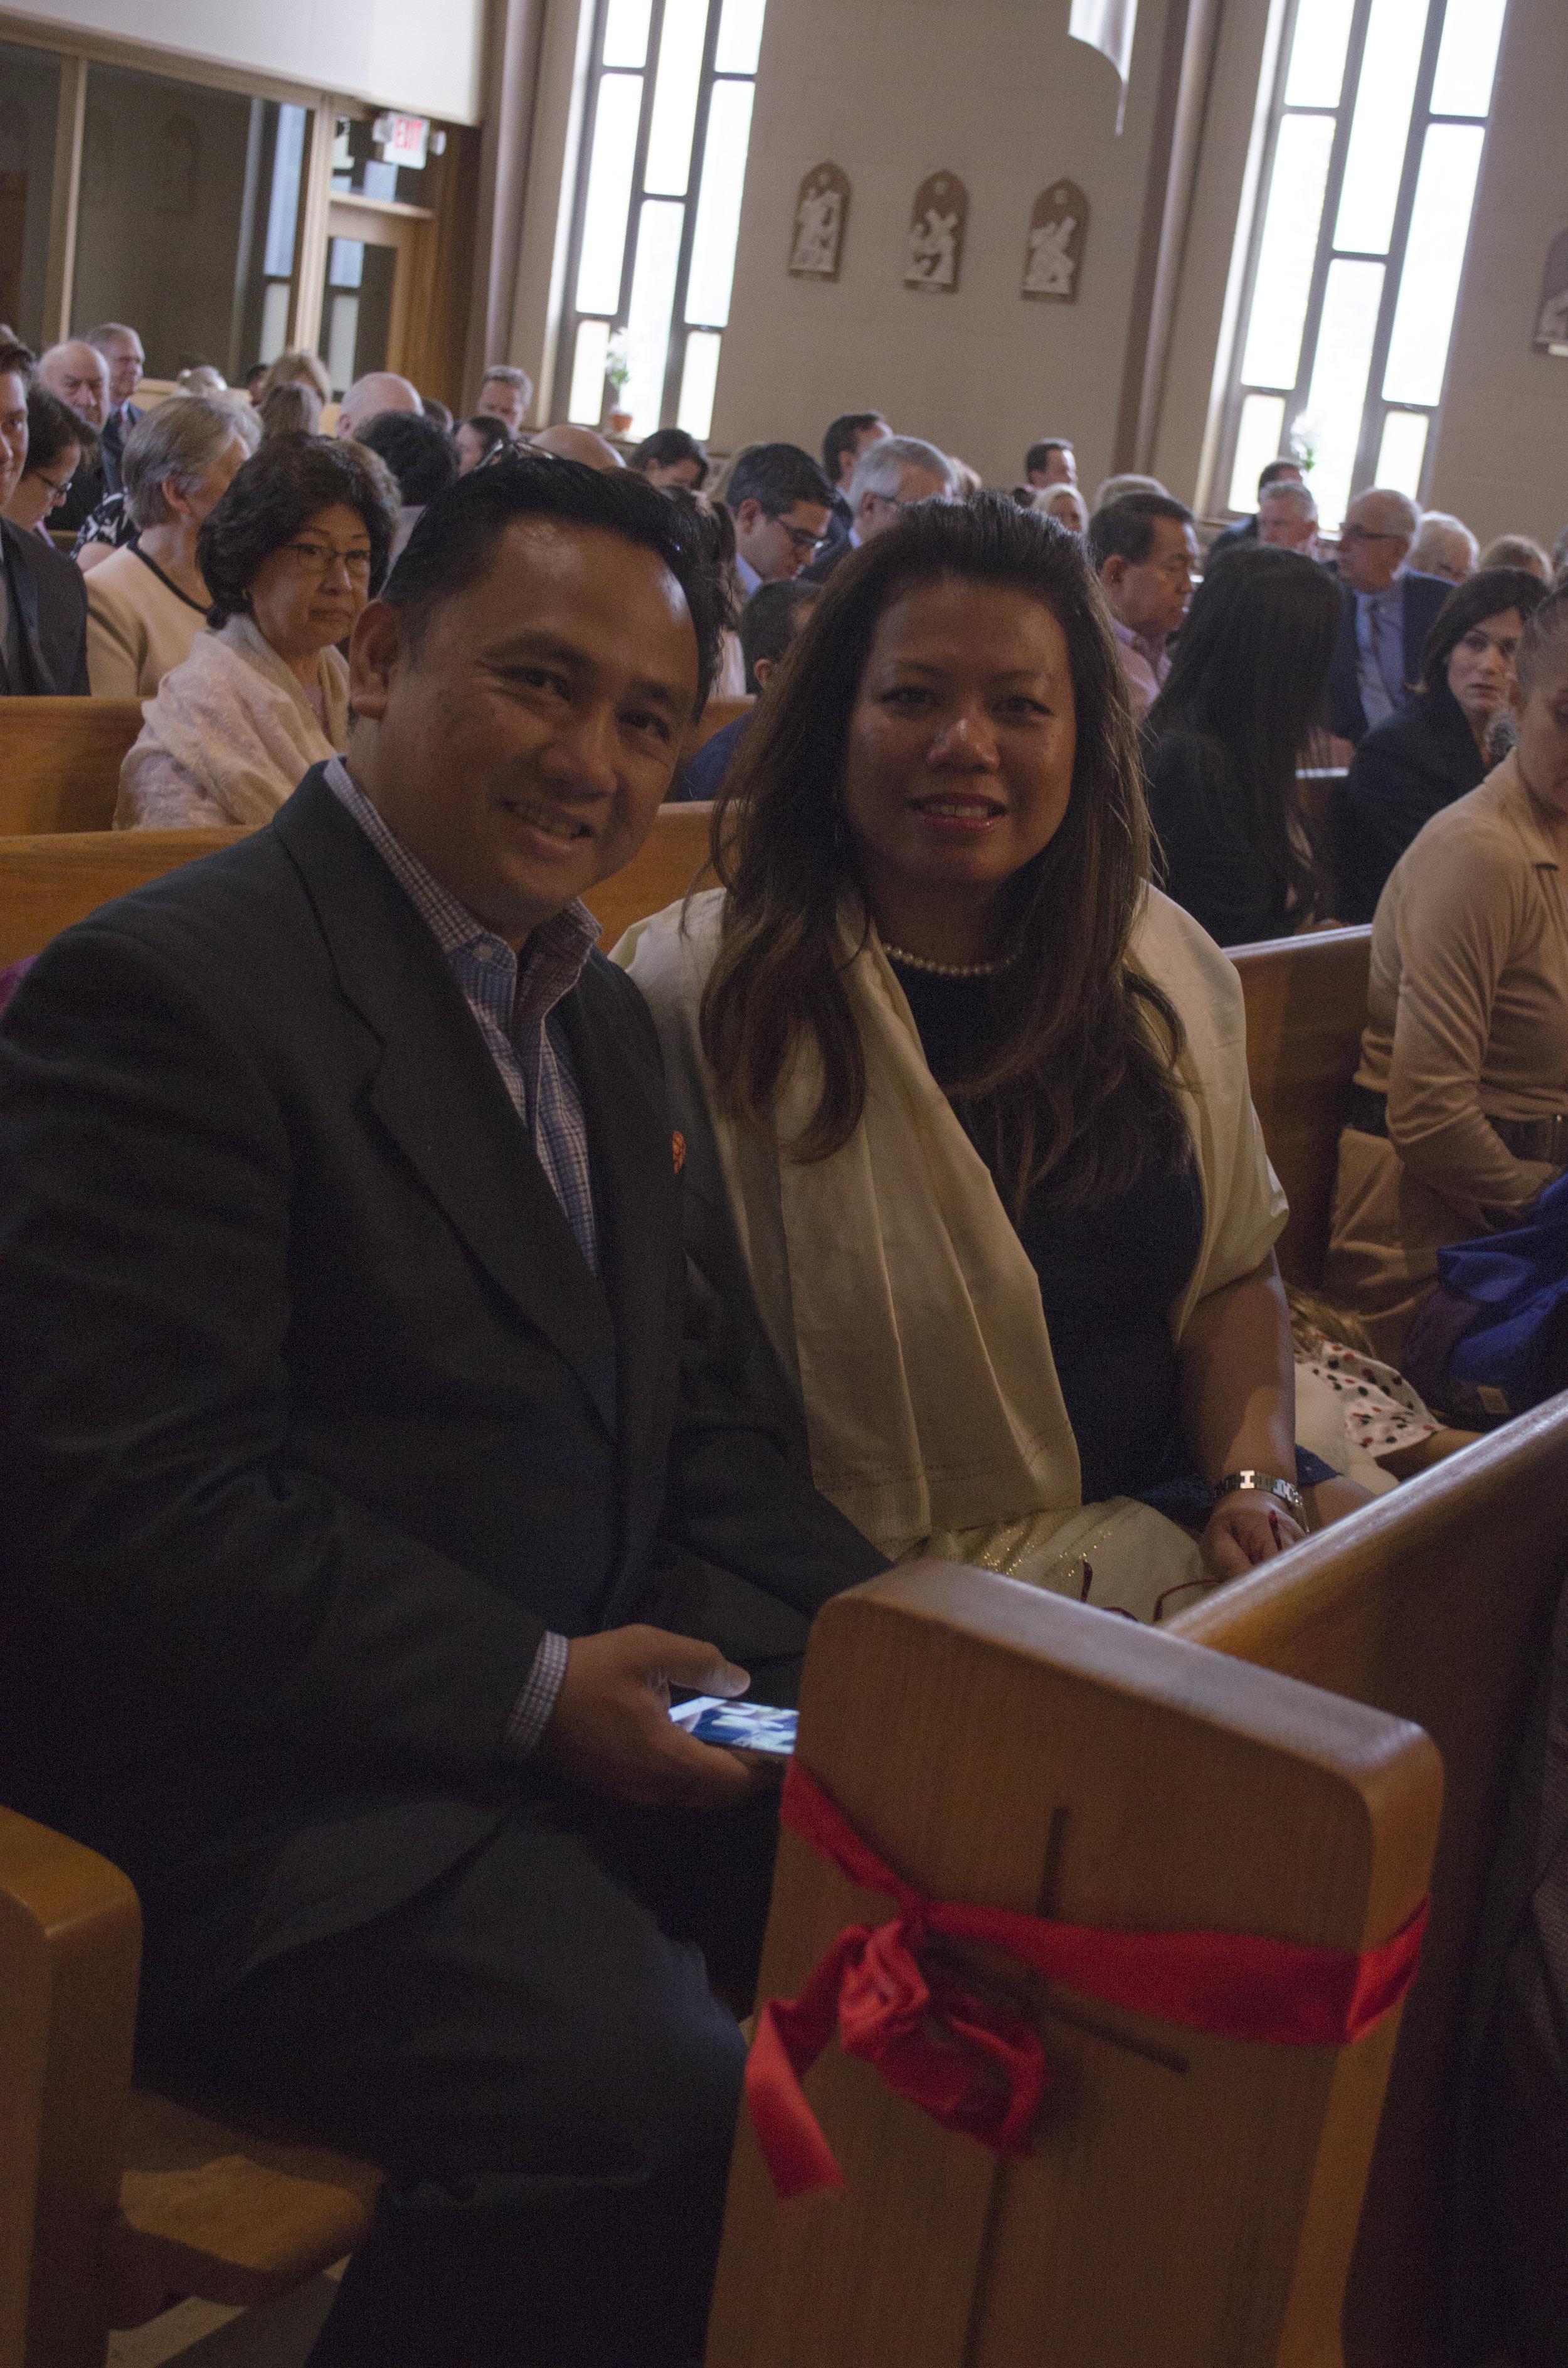 Mom_and_dad_at_the_church_.jpg